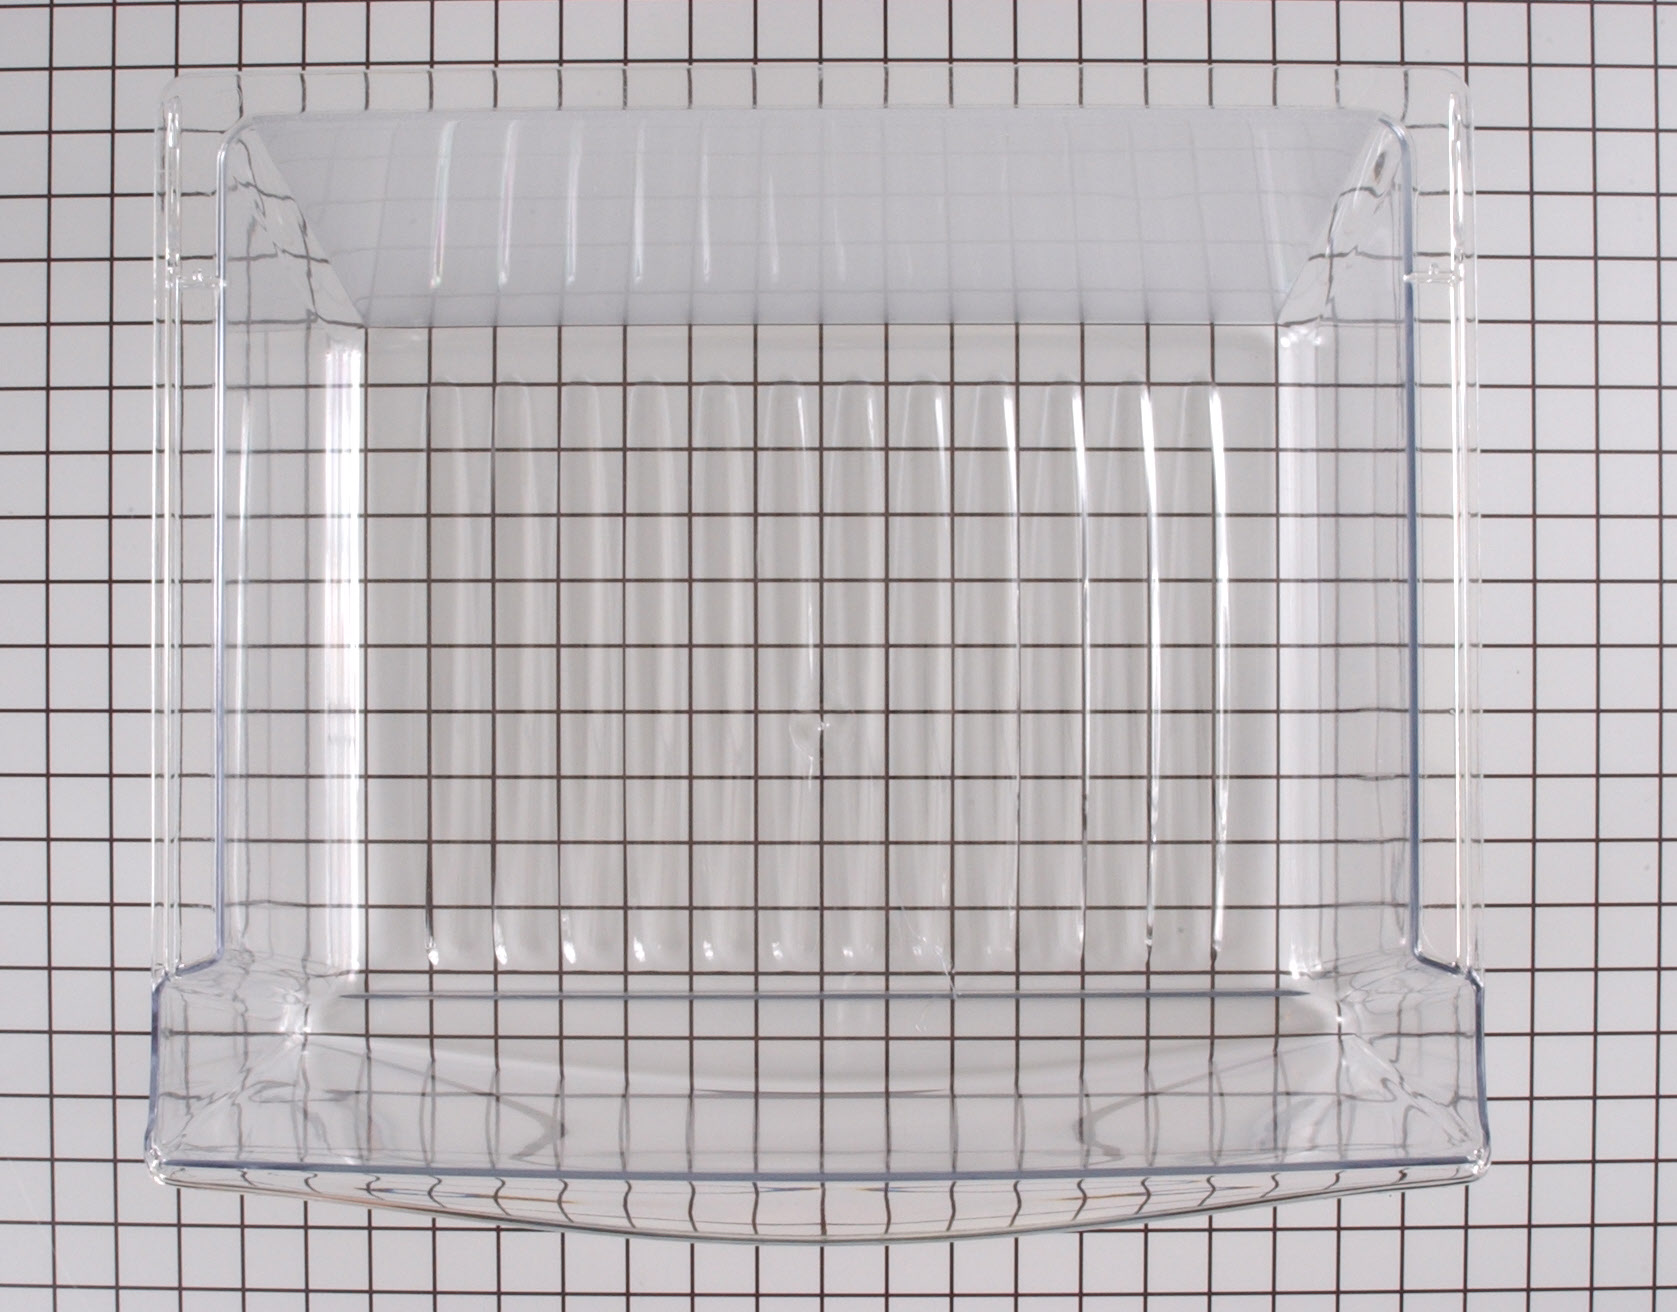 WP67001503 Crosley Refrigerator Part -Crisper Drawer